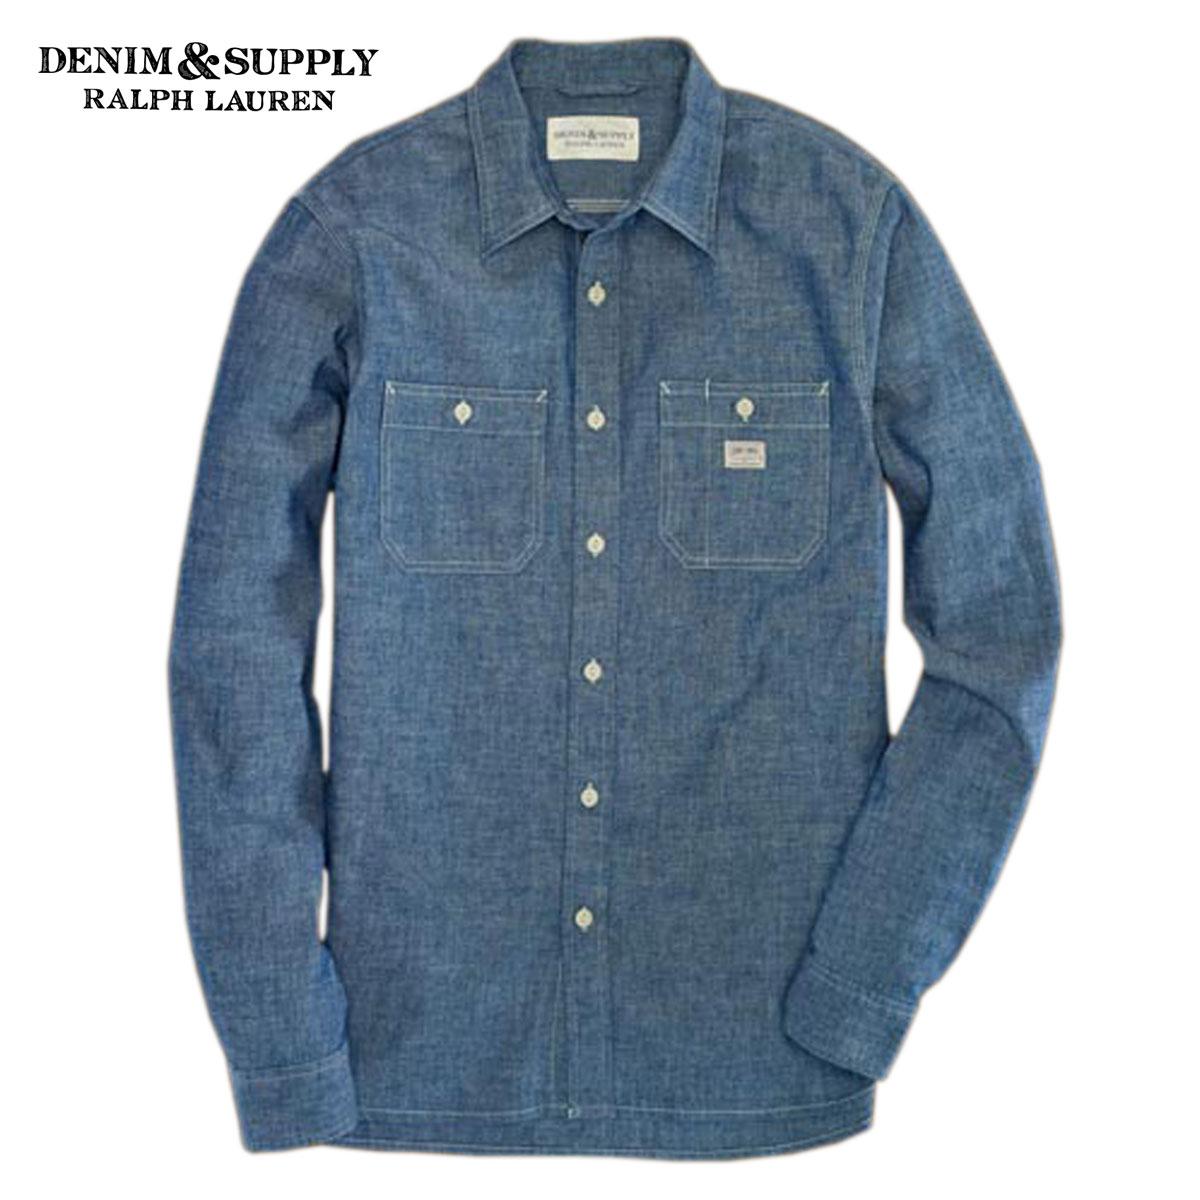 f118731f40 Denimandsurpriralfloren DENIM SUPPLY RALPH LAUREN genuine men s  long-sleeved shirt SELVEDGE CHAMBRAY WORKSHIRT